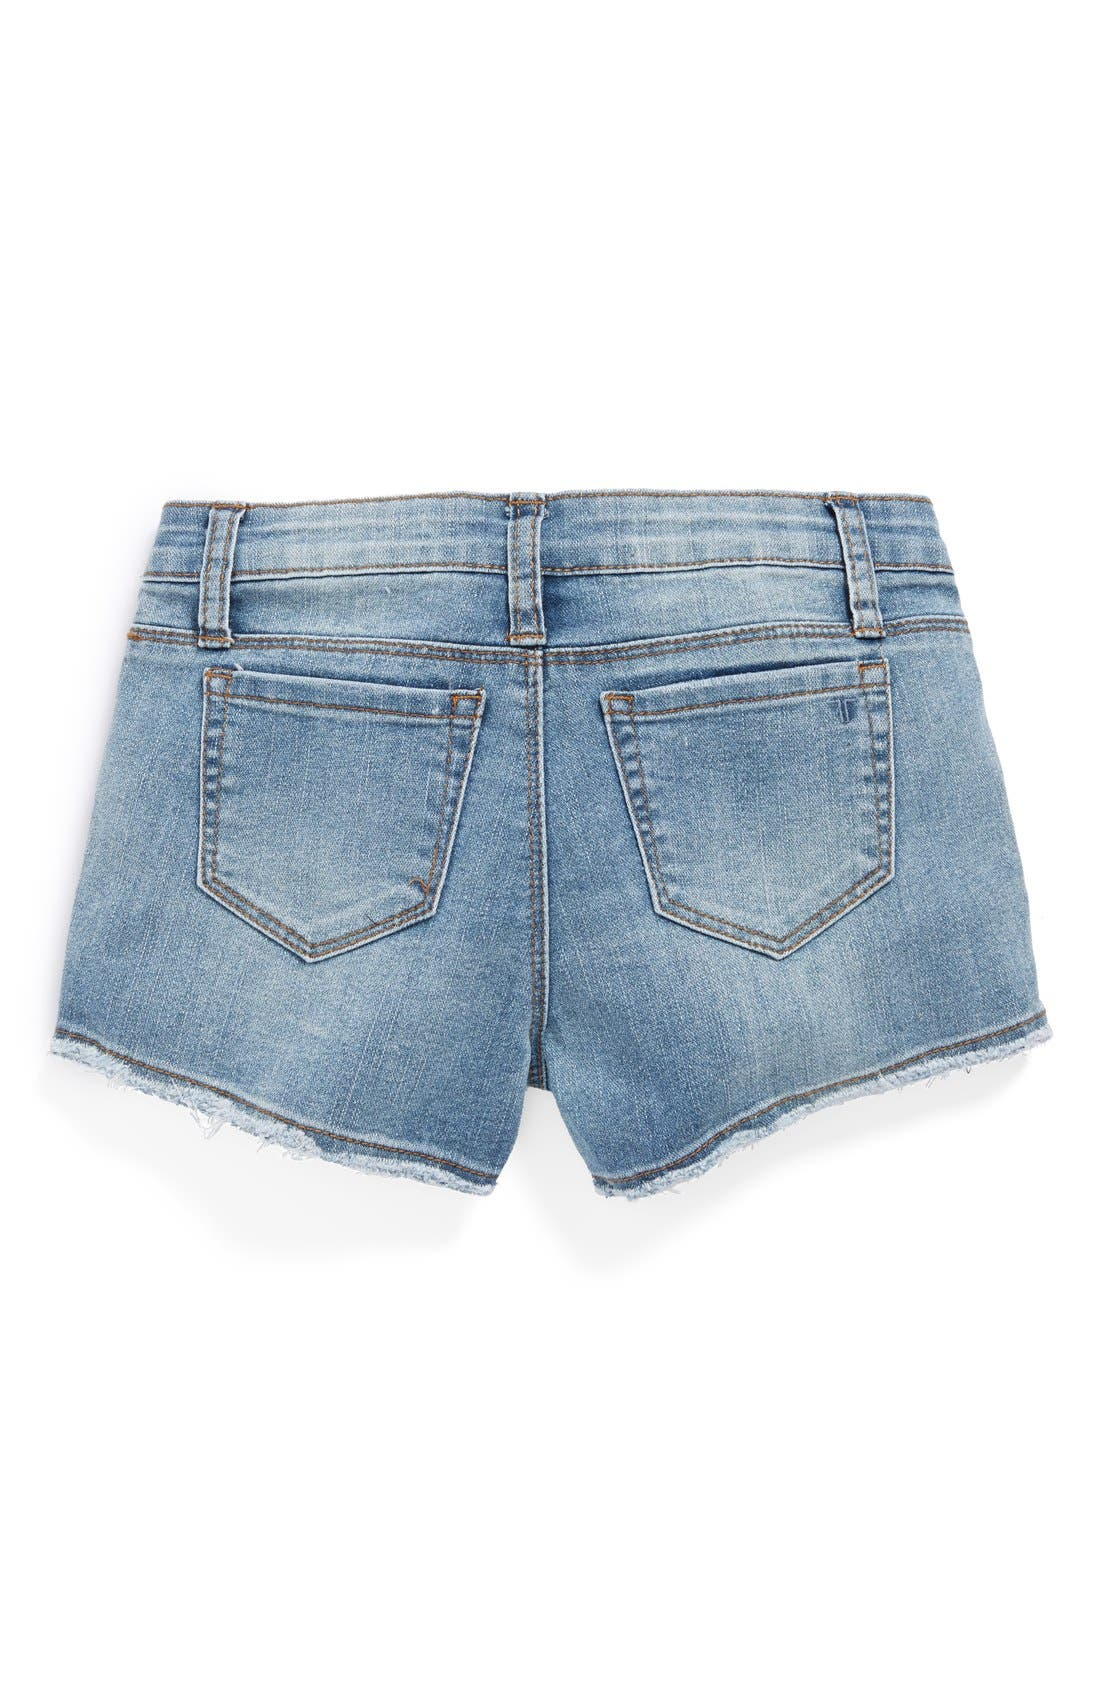 Alternate Image 1 Selected - Tractr Frayed Denim Shorts (Big Girls)